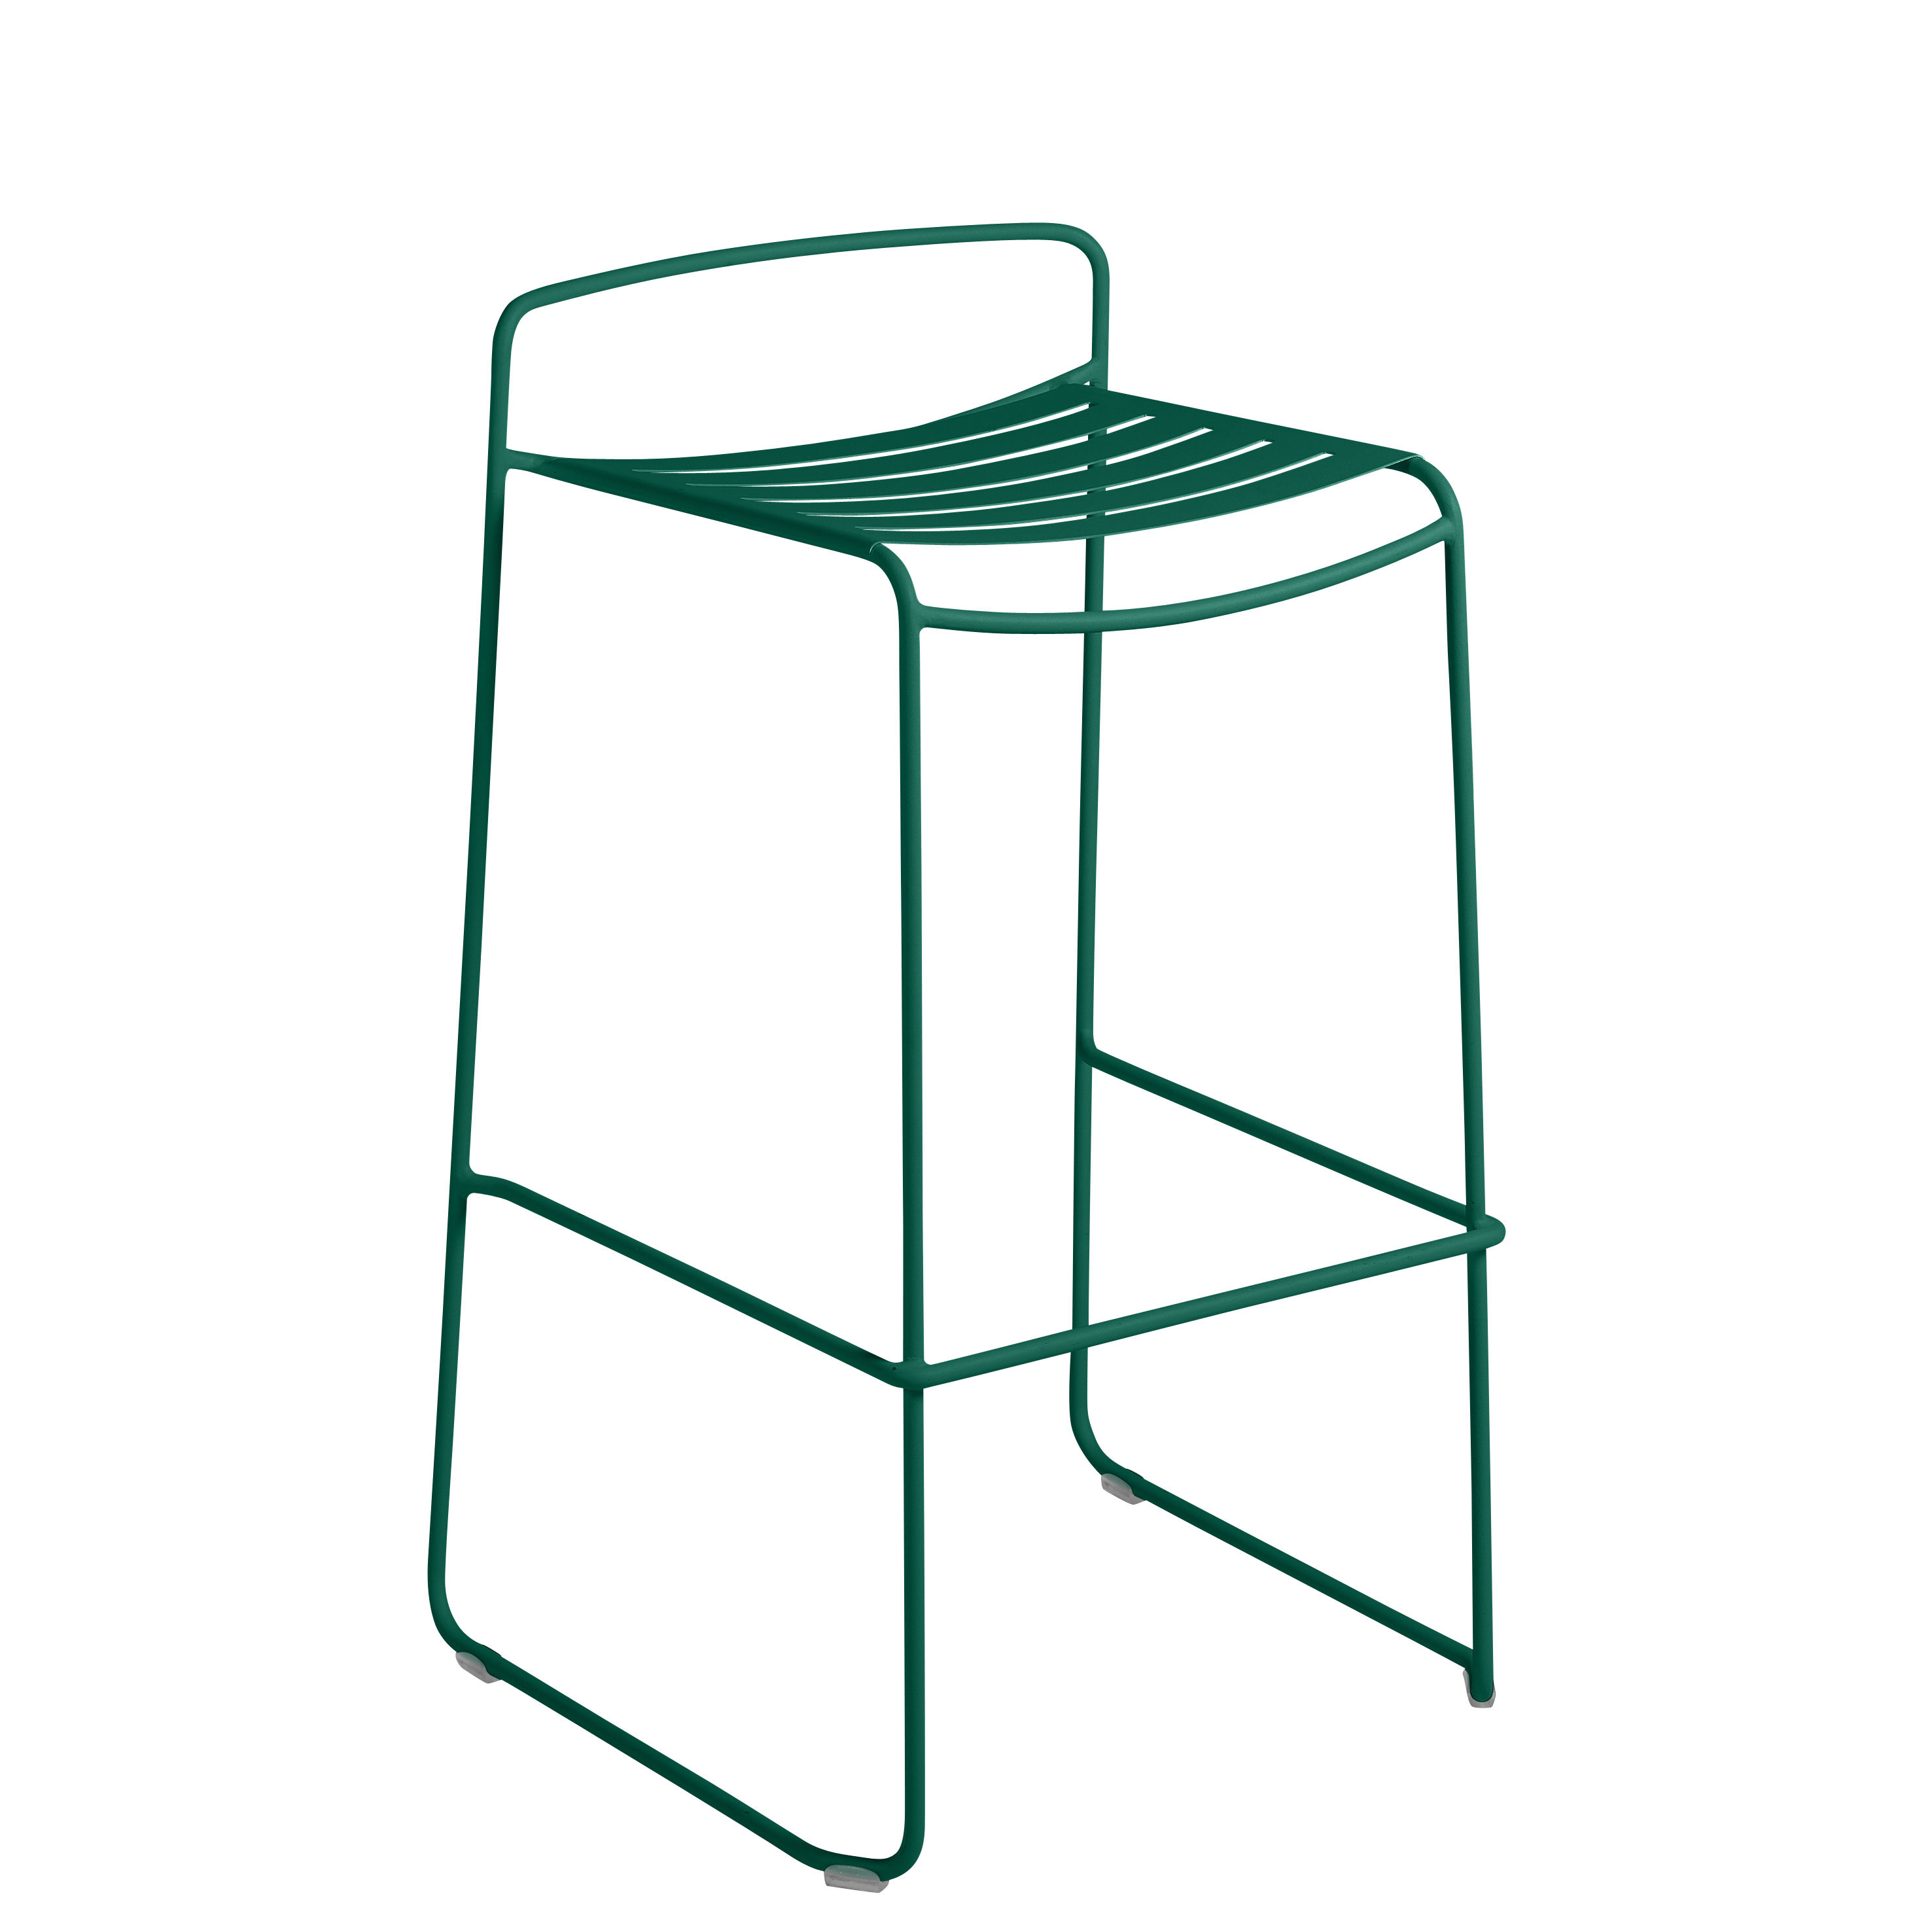 Möbel - Barhocker - Surprising Barhocker / Metall - H 78 cm - Fermob - Zederngrün - bemalter Stahl